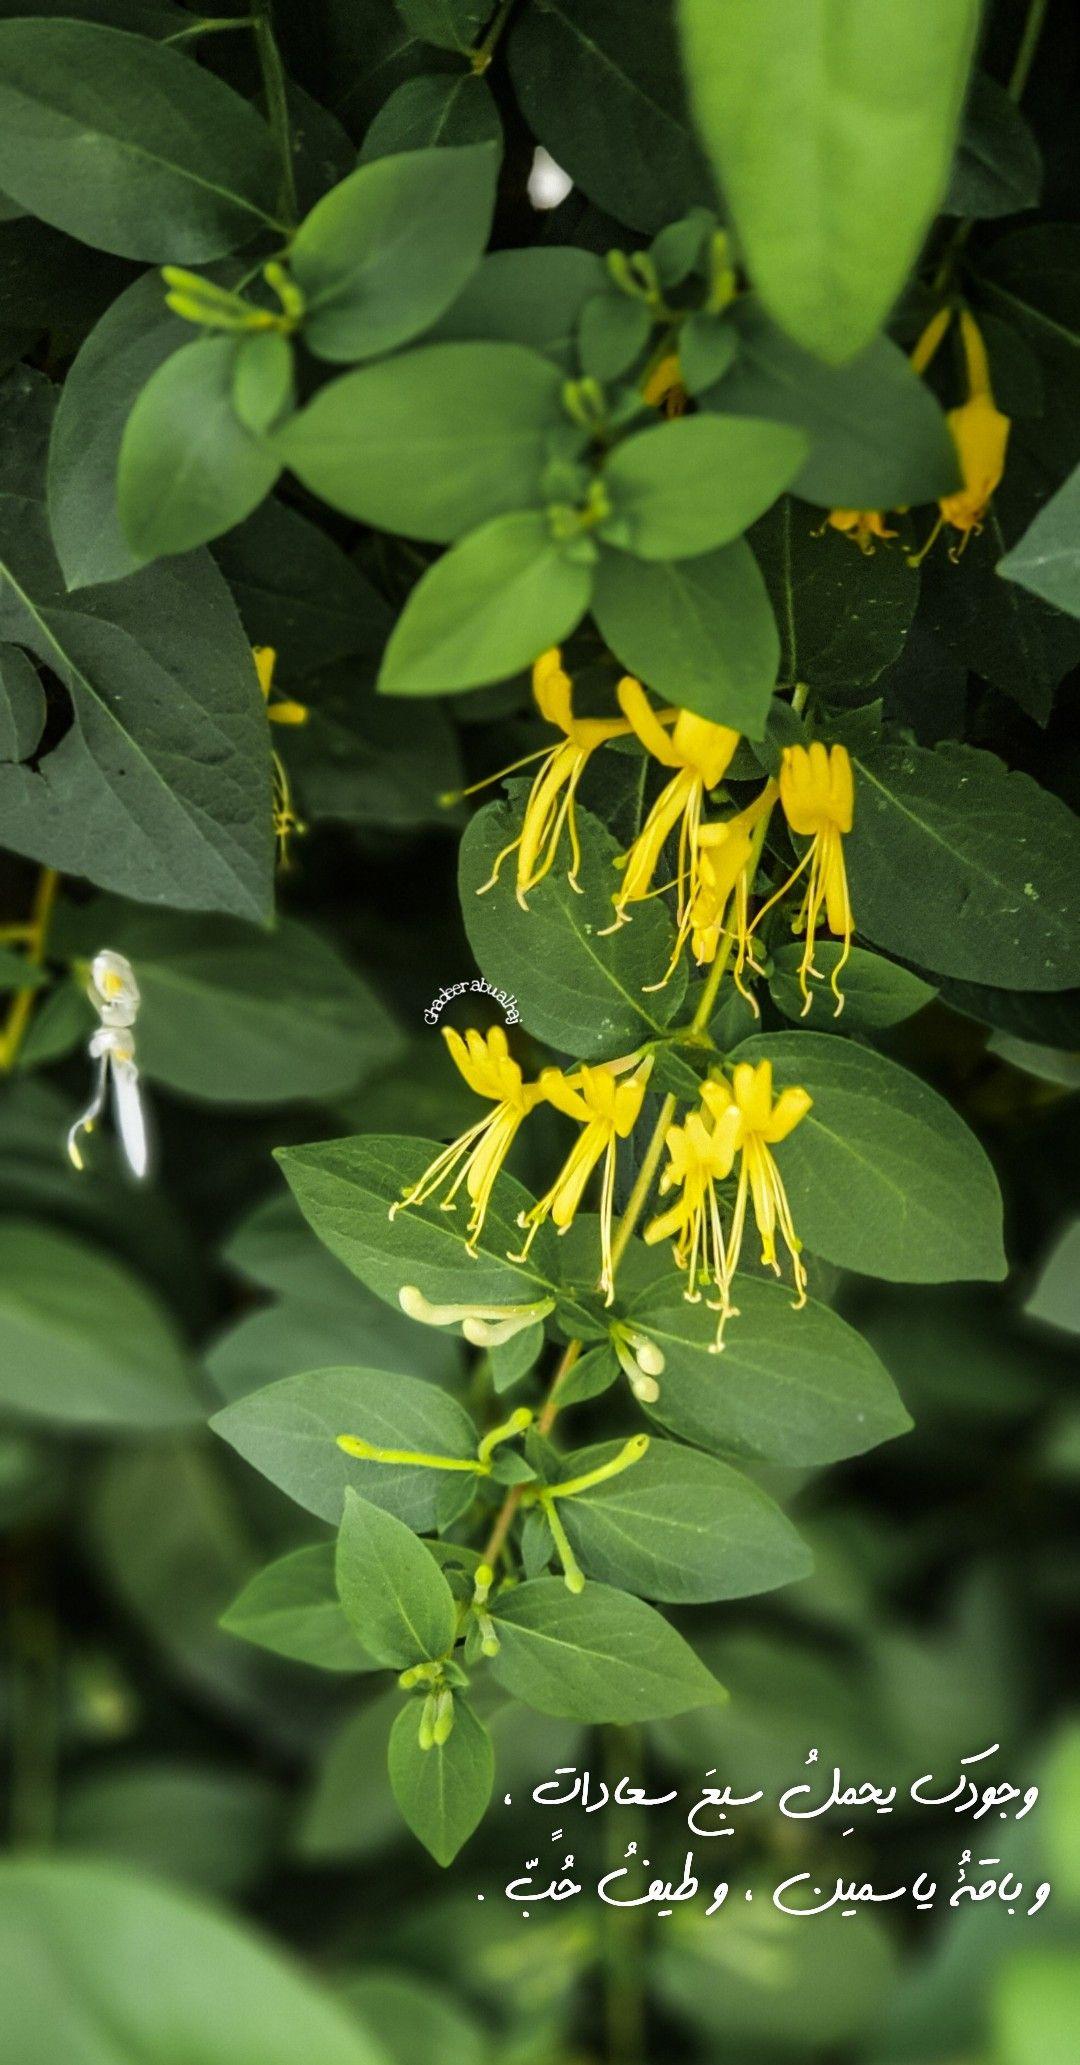 وجودك يحم ل سبع سعادات و باقة ياسمين و طيف ح ب Daisy Art Plant Leaves Flowers